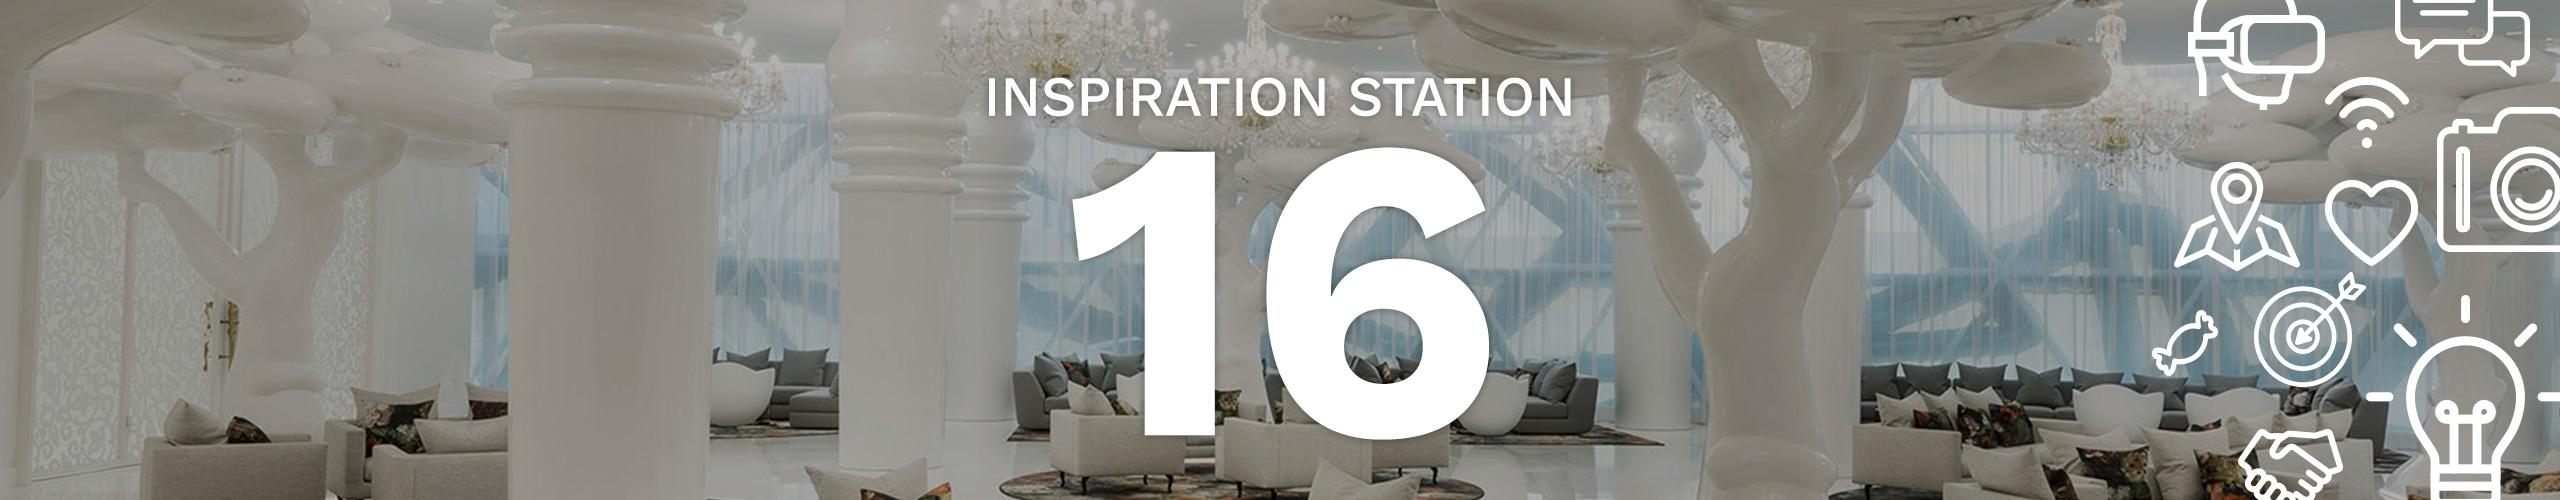 Inspiration Station <br/> Vol. 16